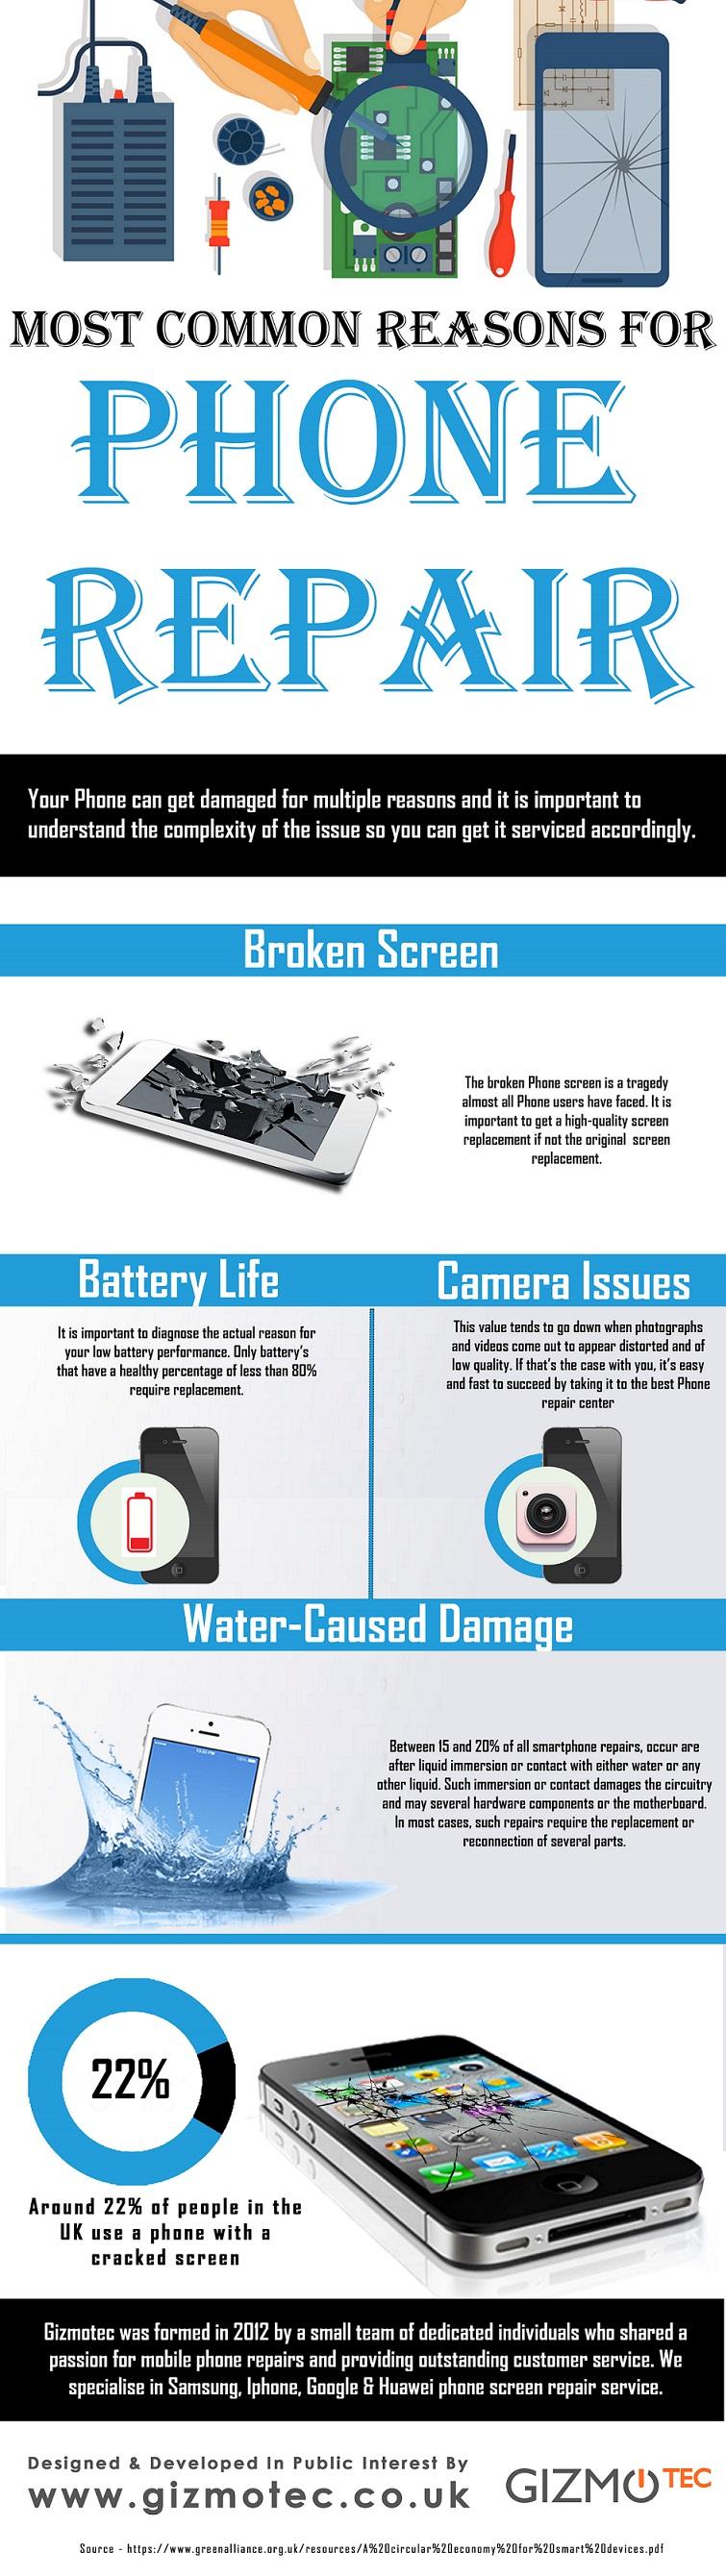 Most Common Reasons For Phone Repair